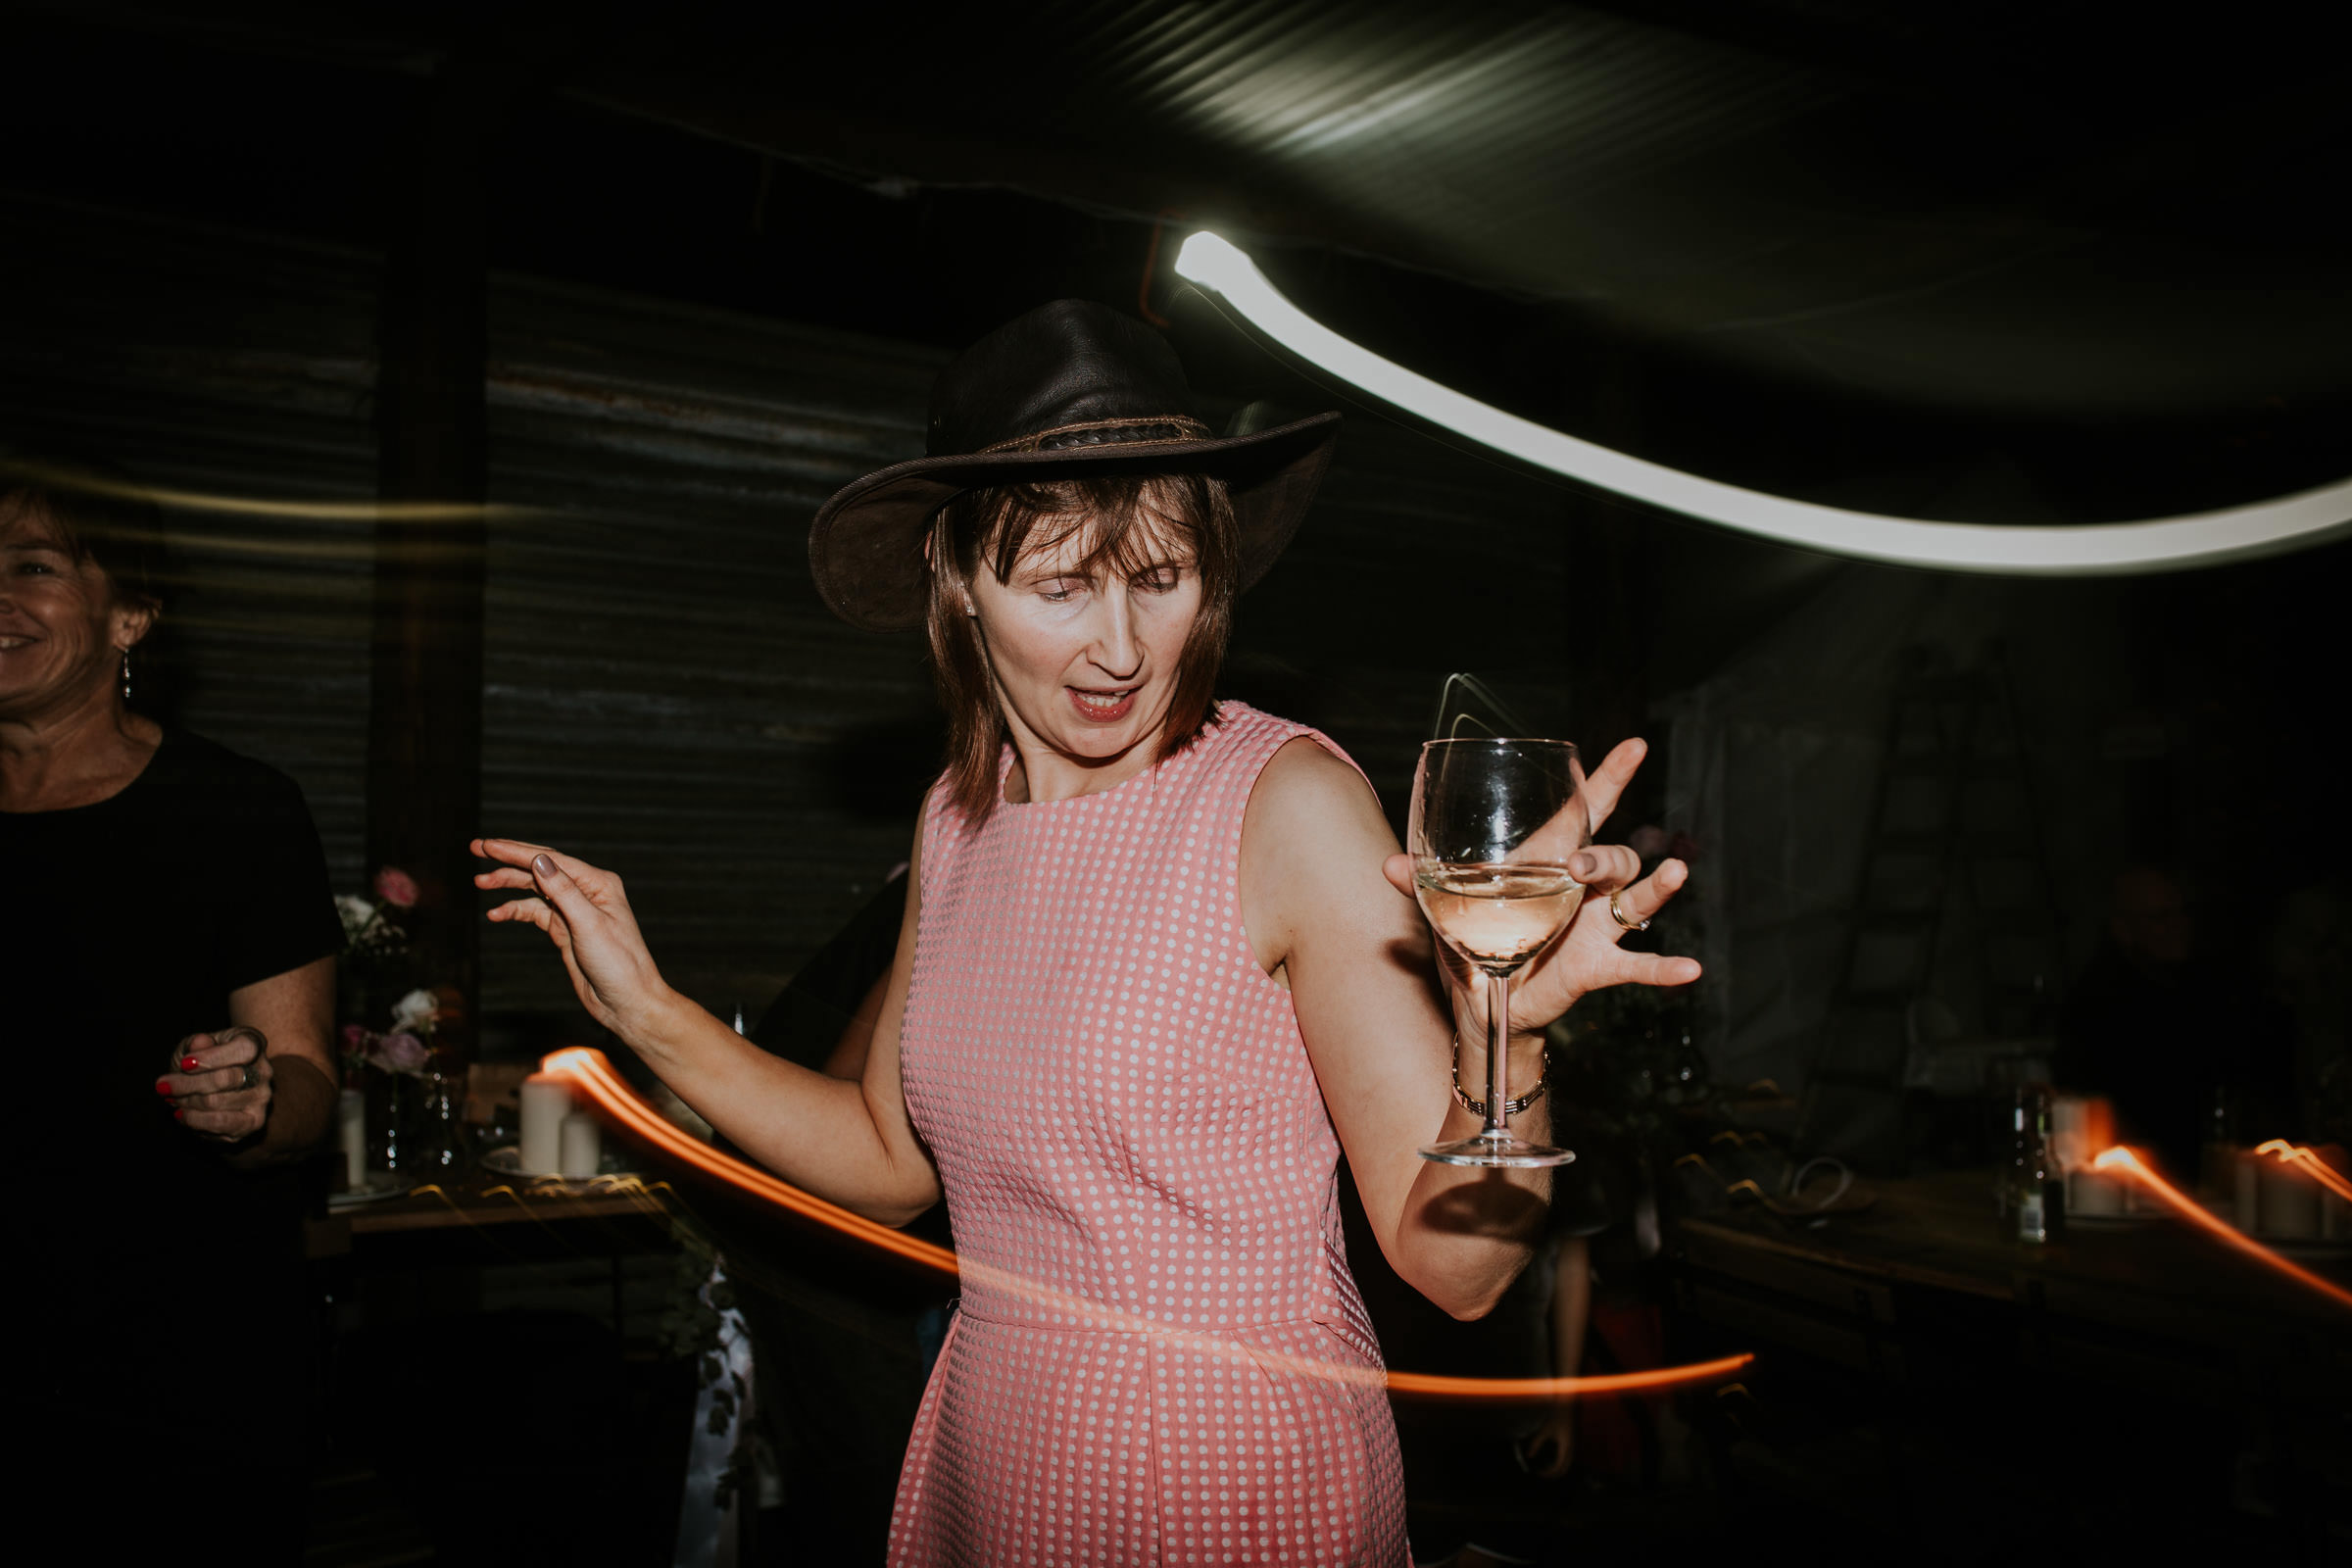 Emma+John+Far+South+Coast+Wedding+Festivl+Glamping+Bush-167.jpg